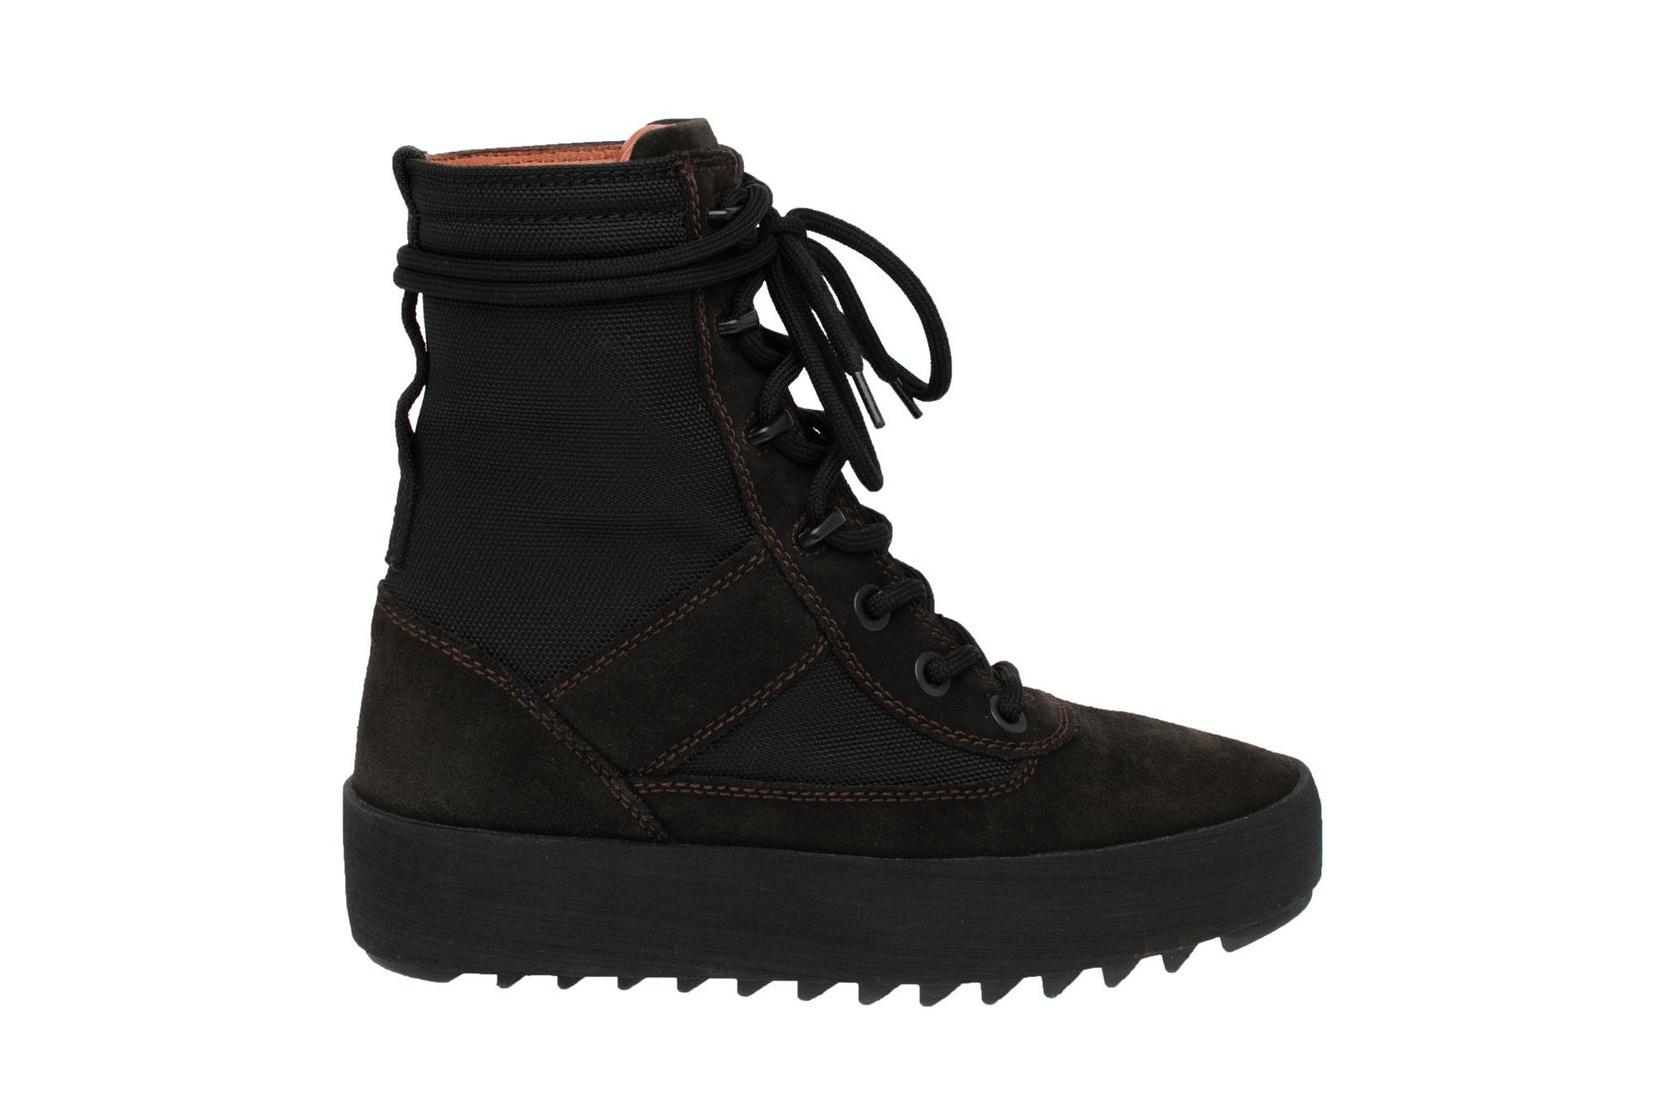 yeezy-season-3-footwear-1.jpg